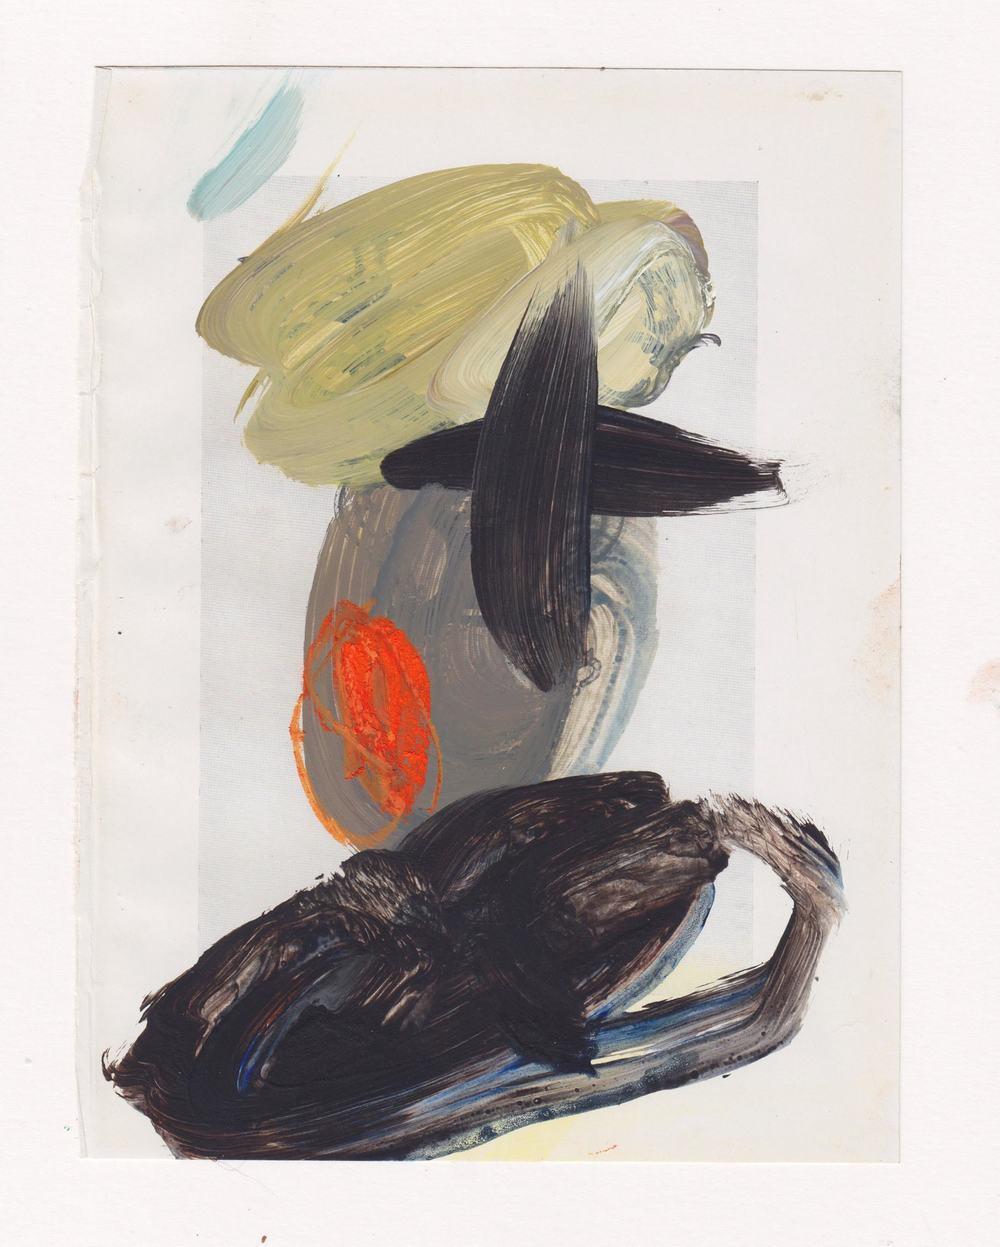 Caroline Pedler Escape 15 x 21 cm acrylic on paper £ 425